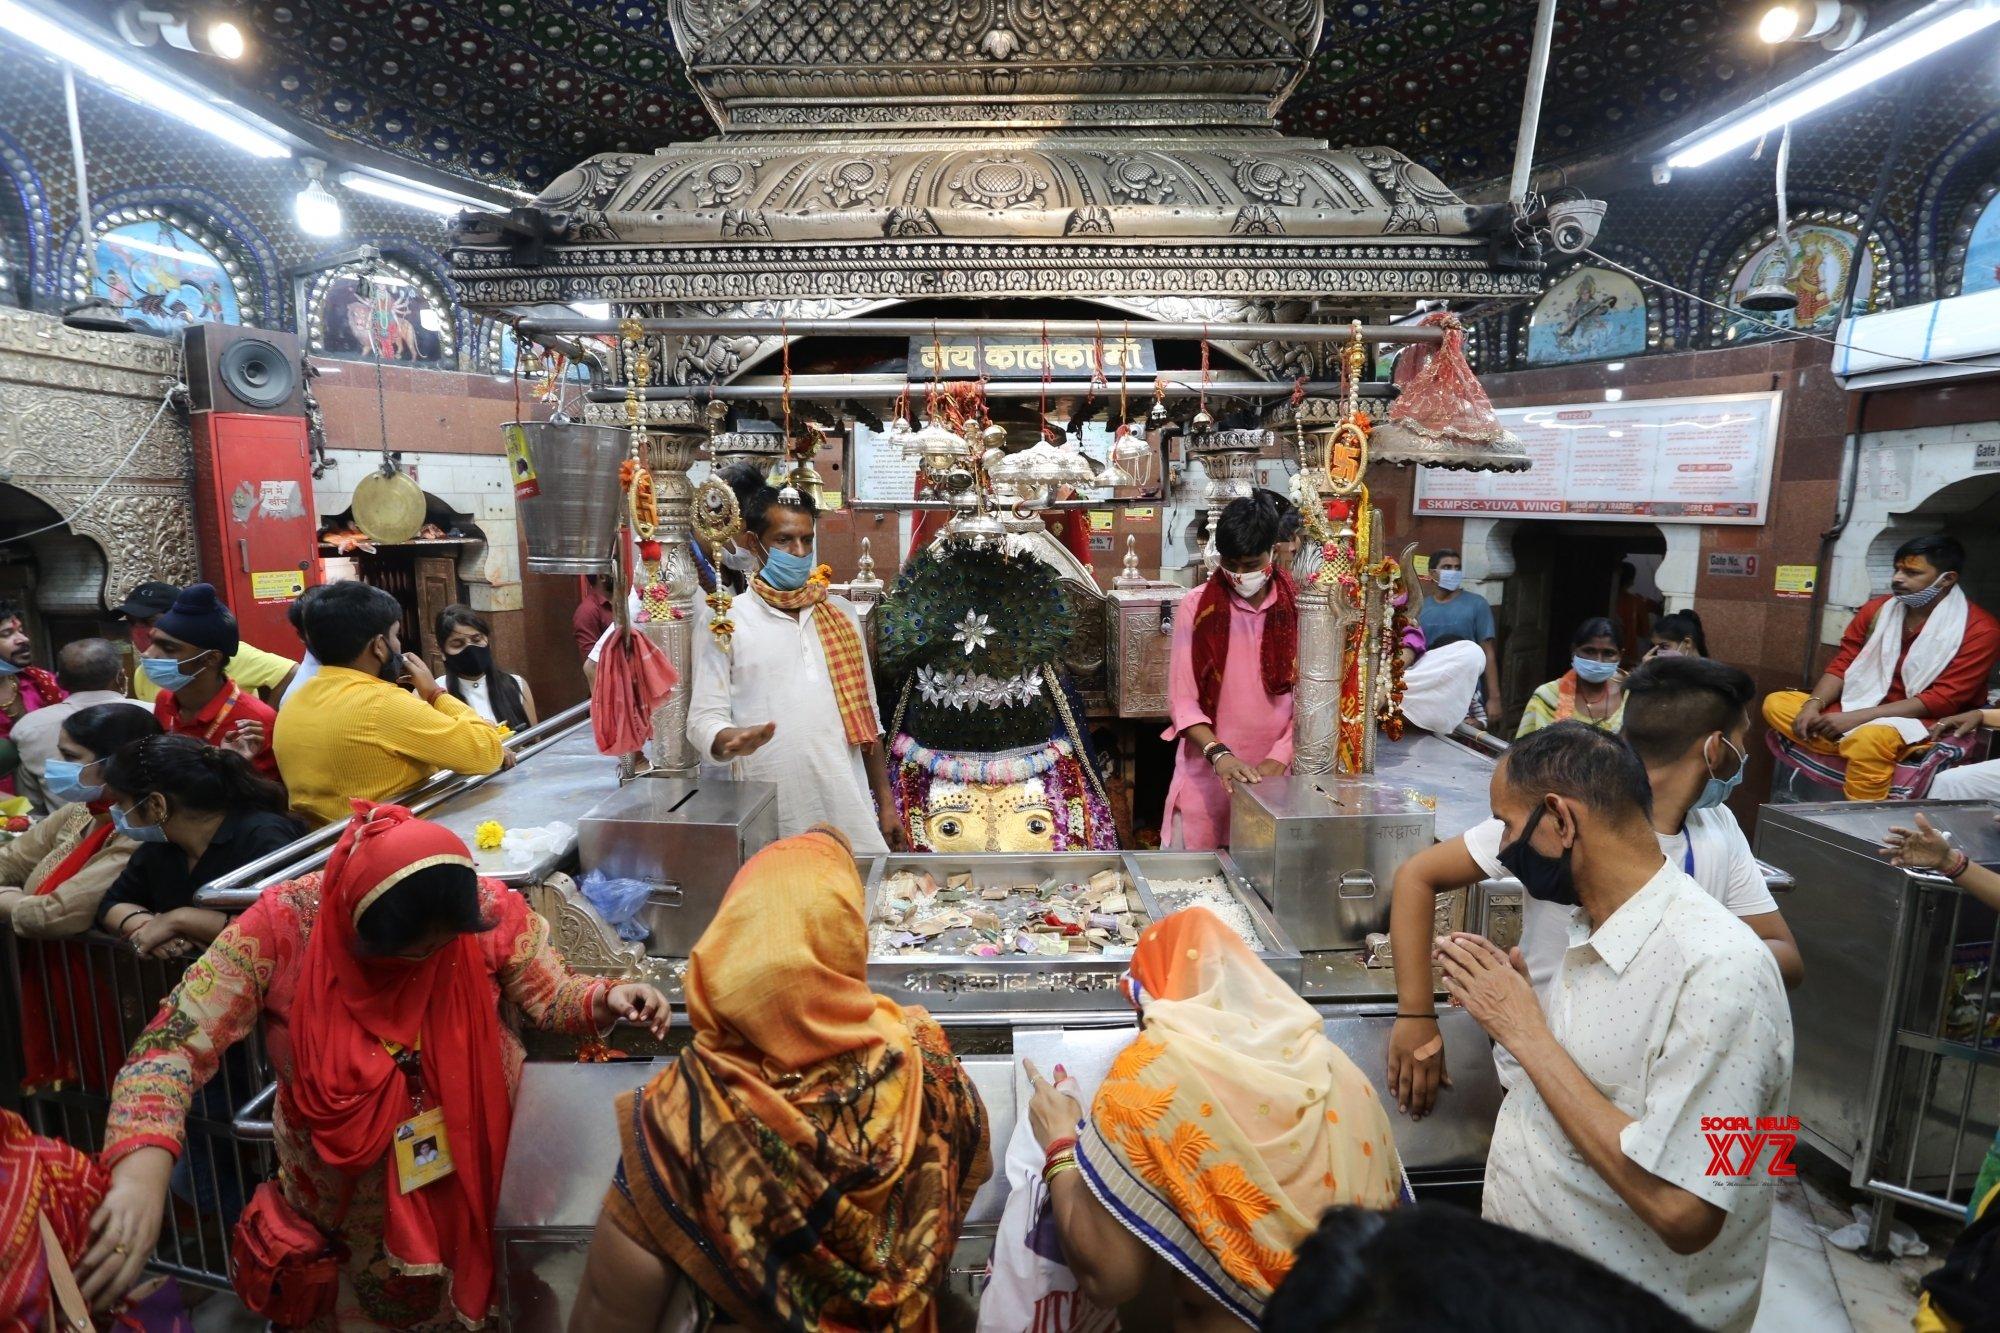 New Delhi: Devotees throng Kalkaji Temple on the first day of Navaratri #Gallery